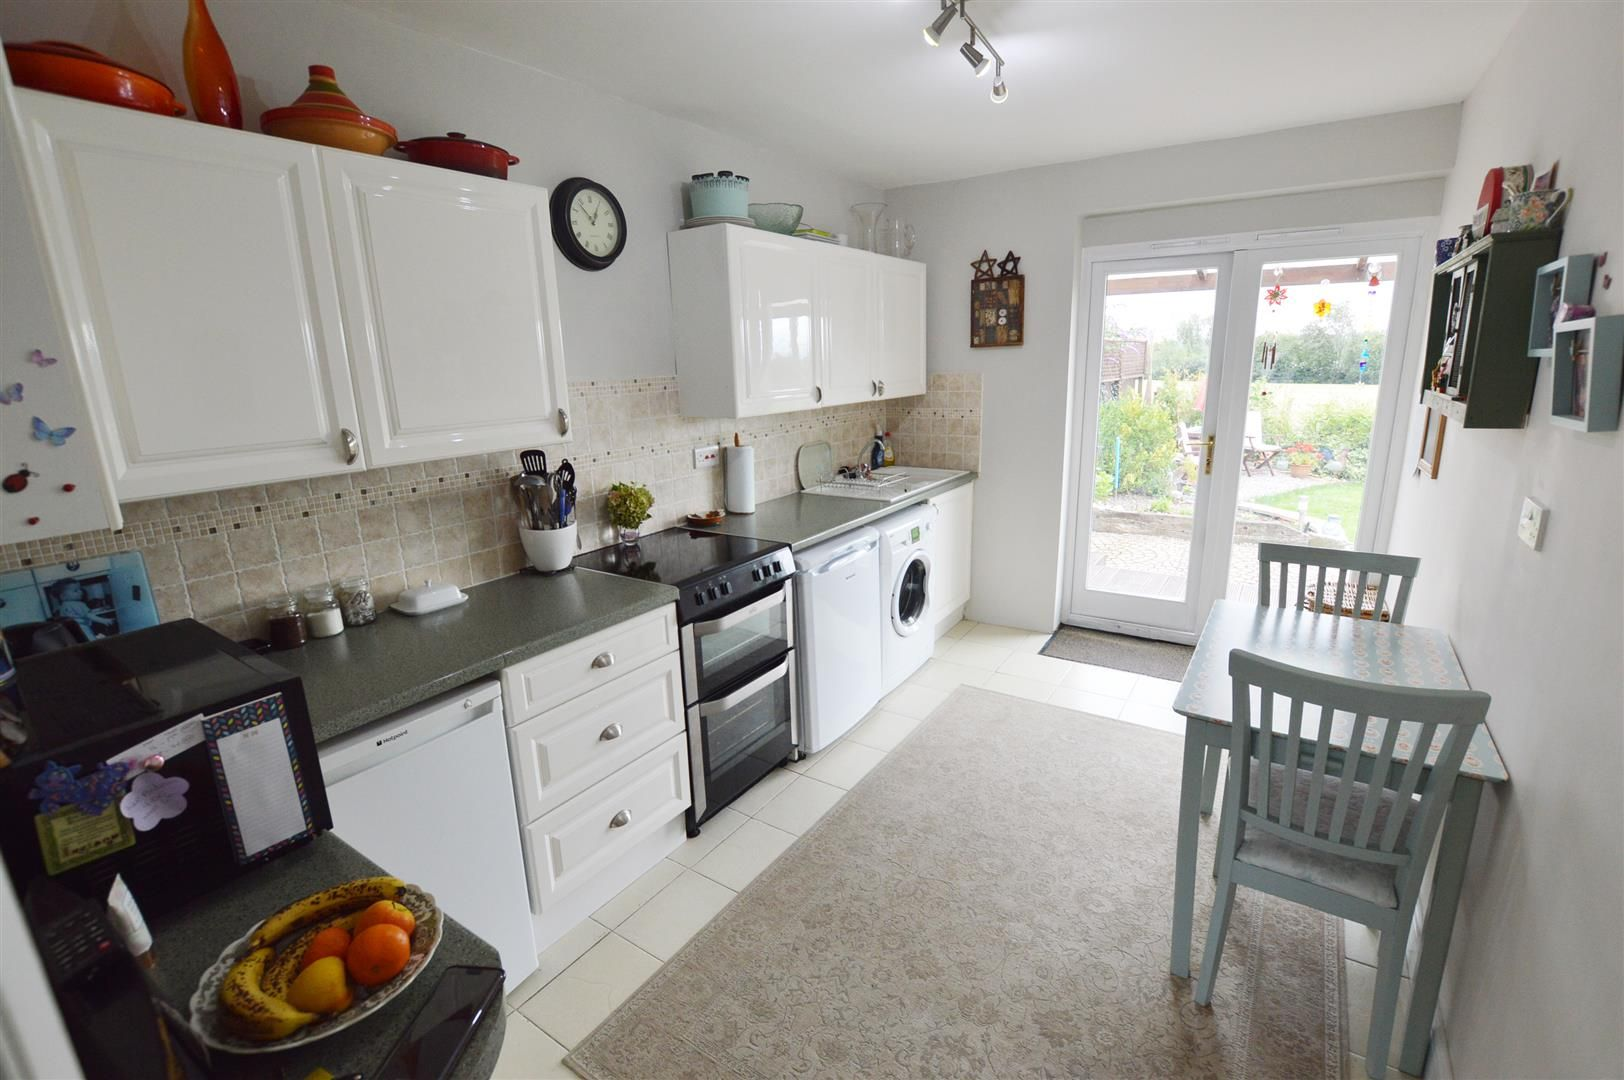 3 bed semi-detached-bungalow for sale in Shobdon 3